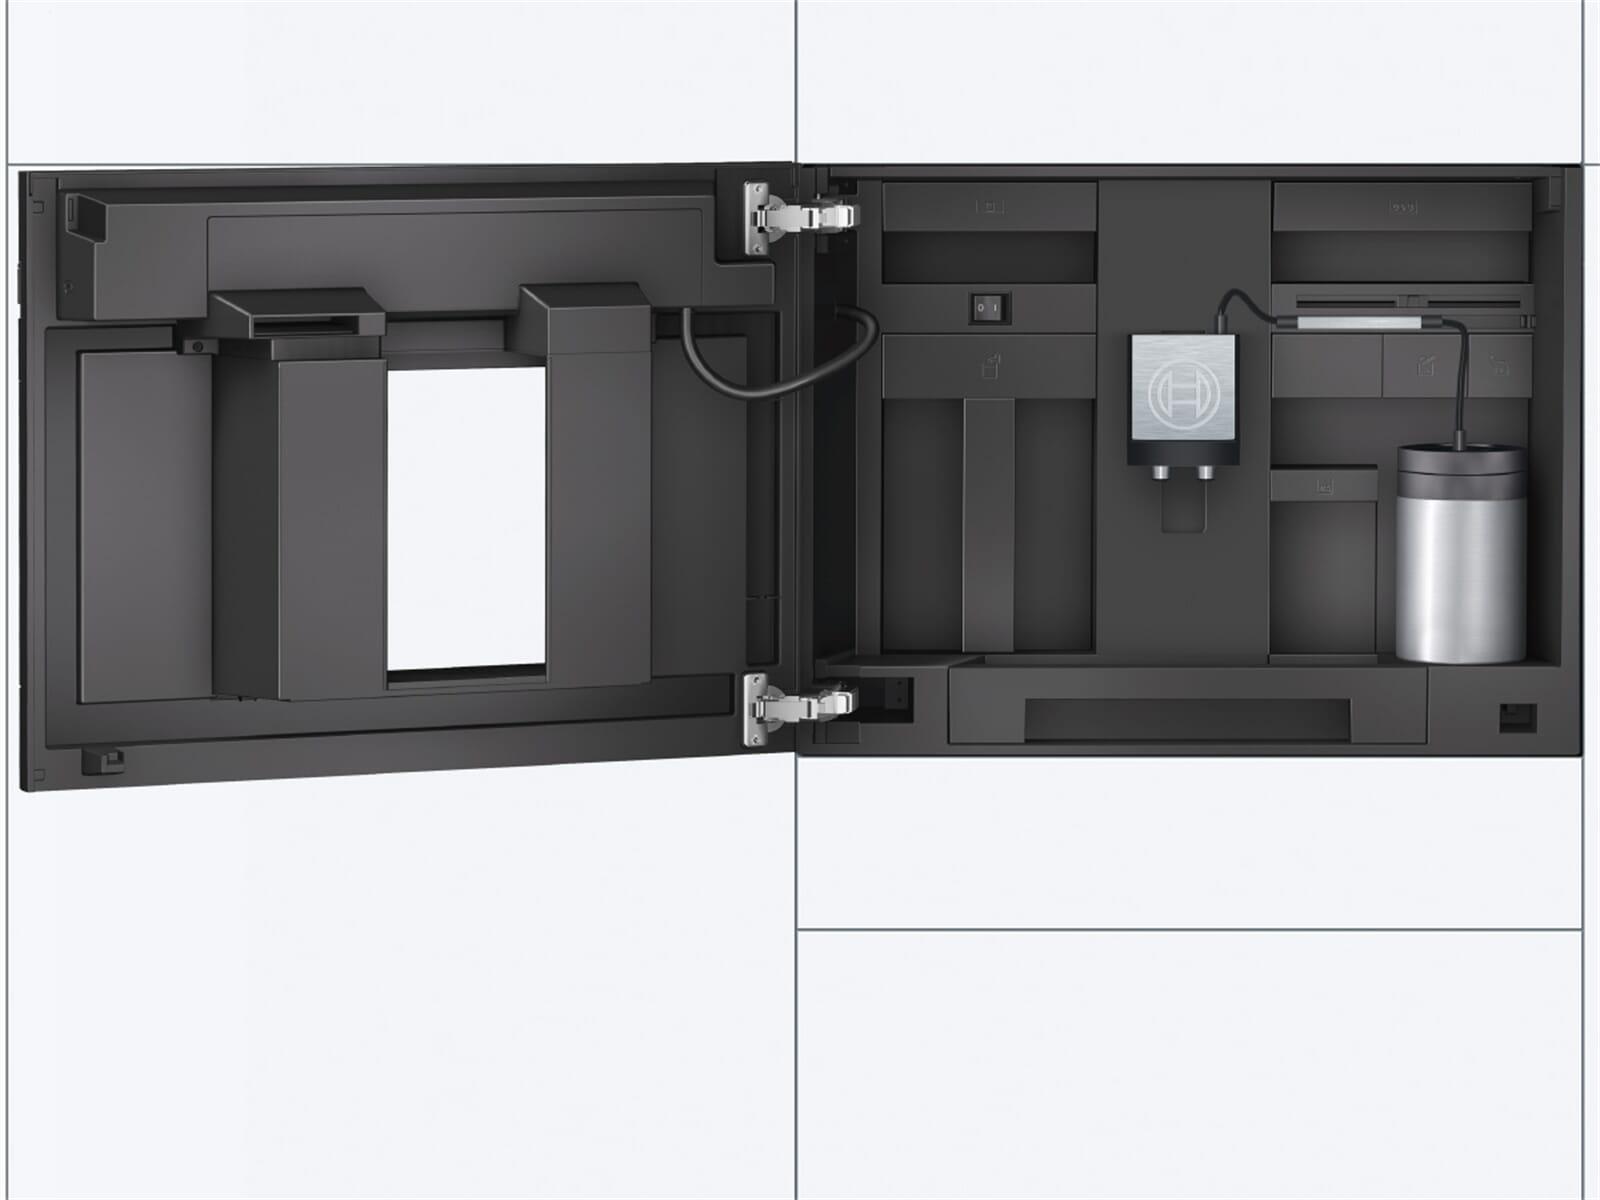 bosch ctl636eb6 einbau espresso kaffeevollautomat schwarz. Black Bedroom Furniture Sets. Home Design Ideas